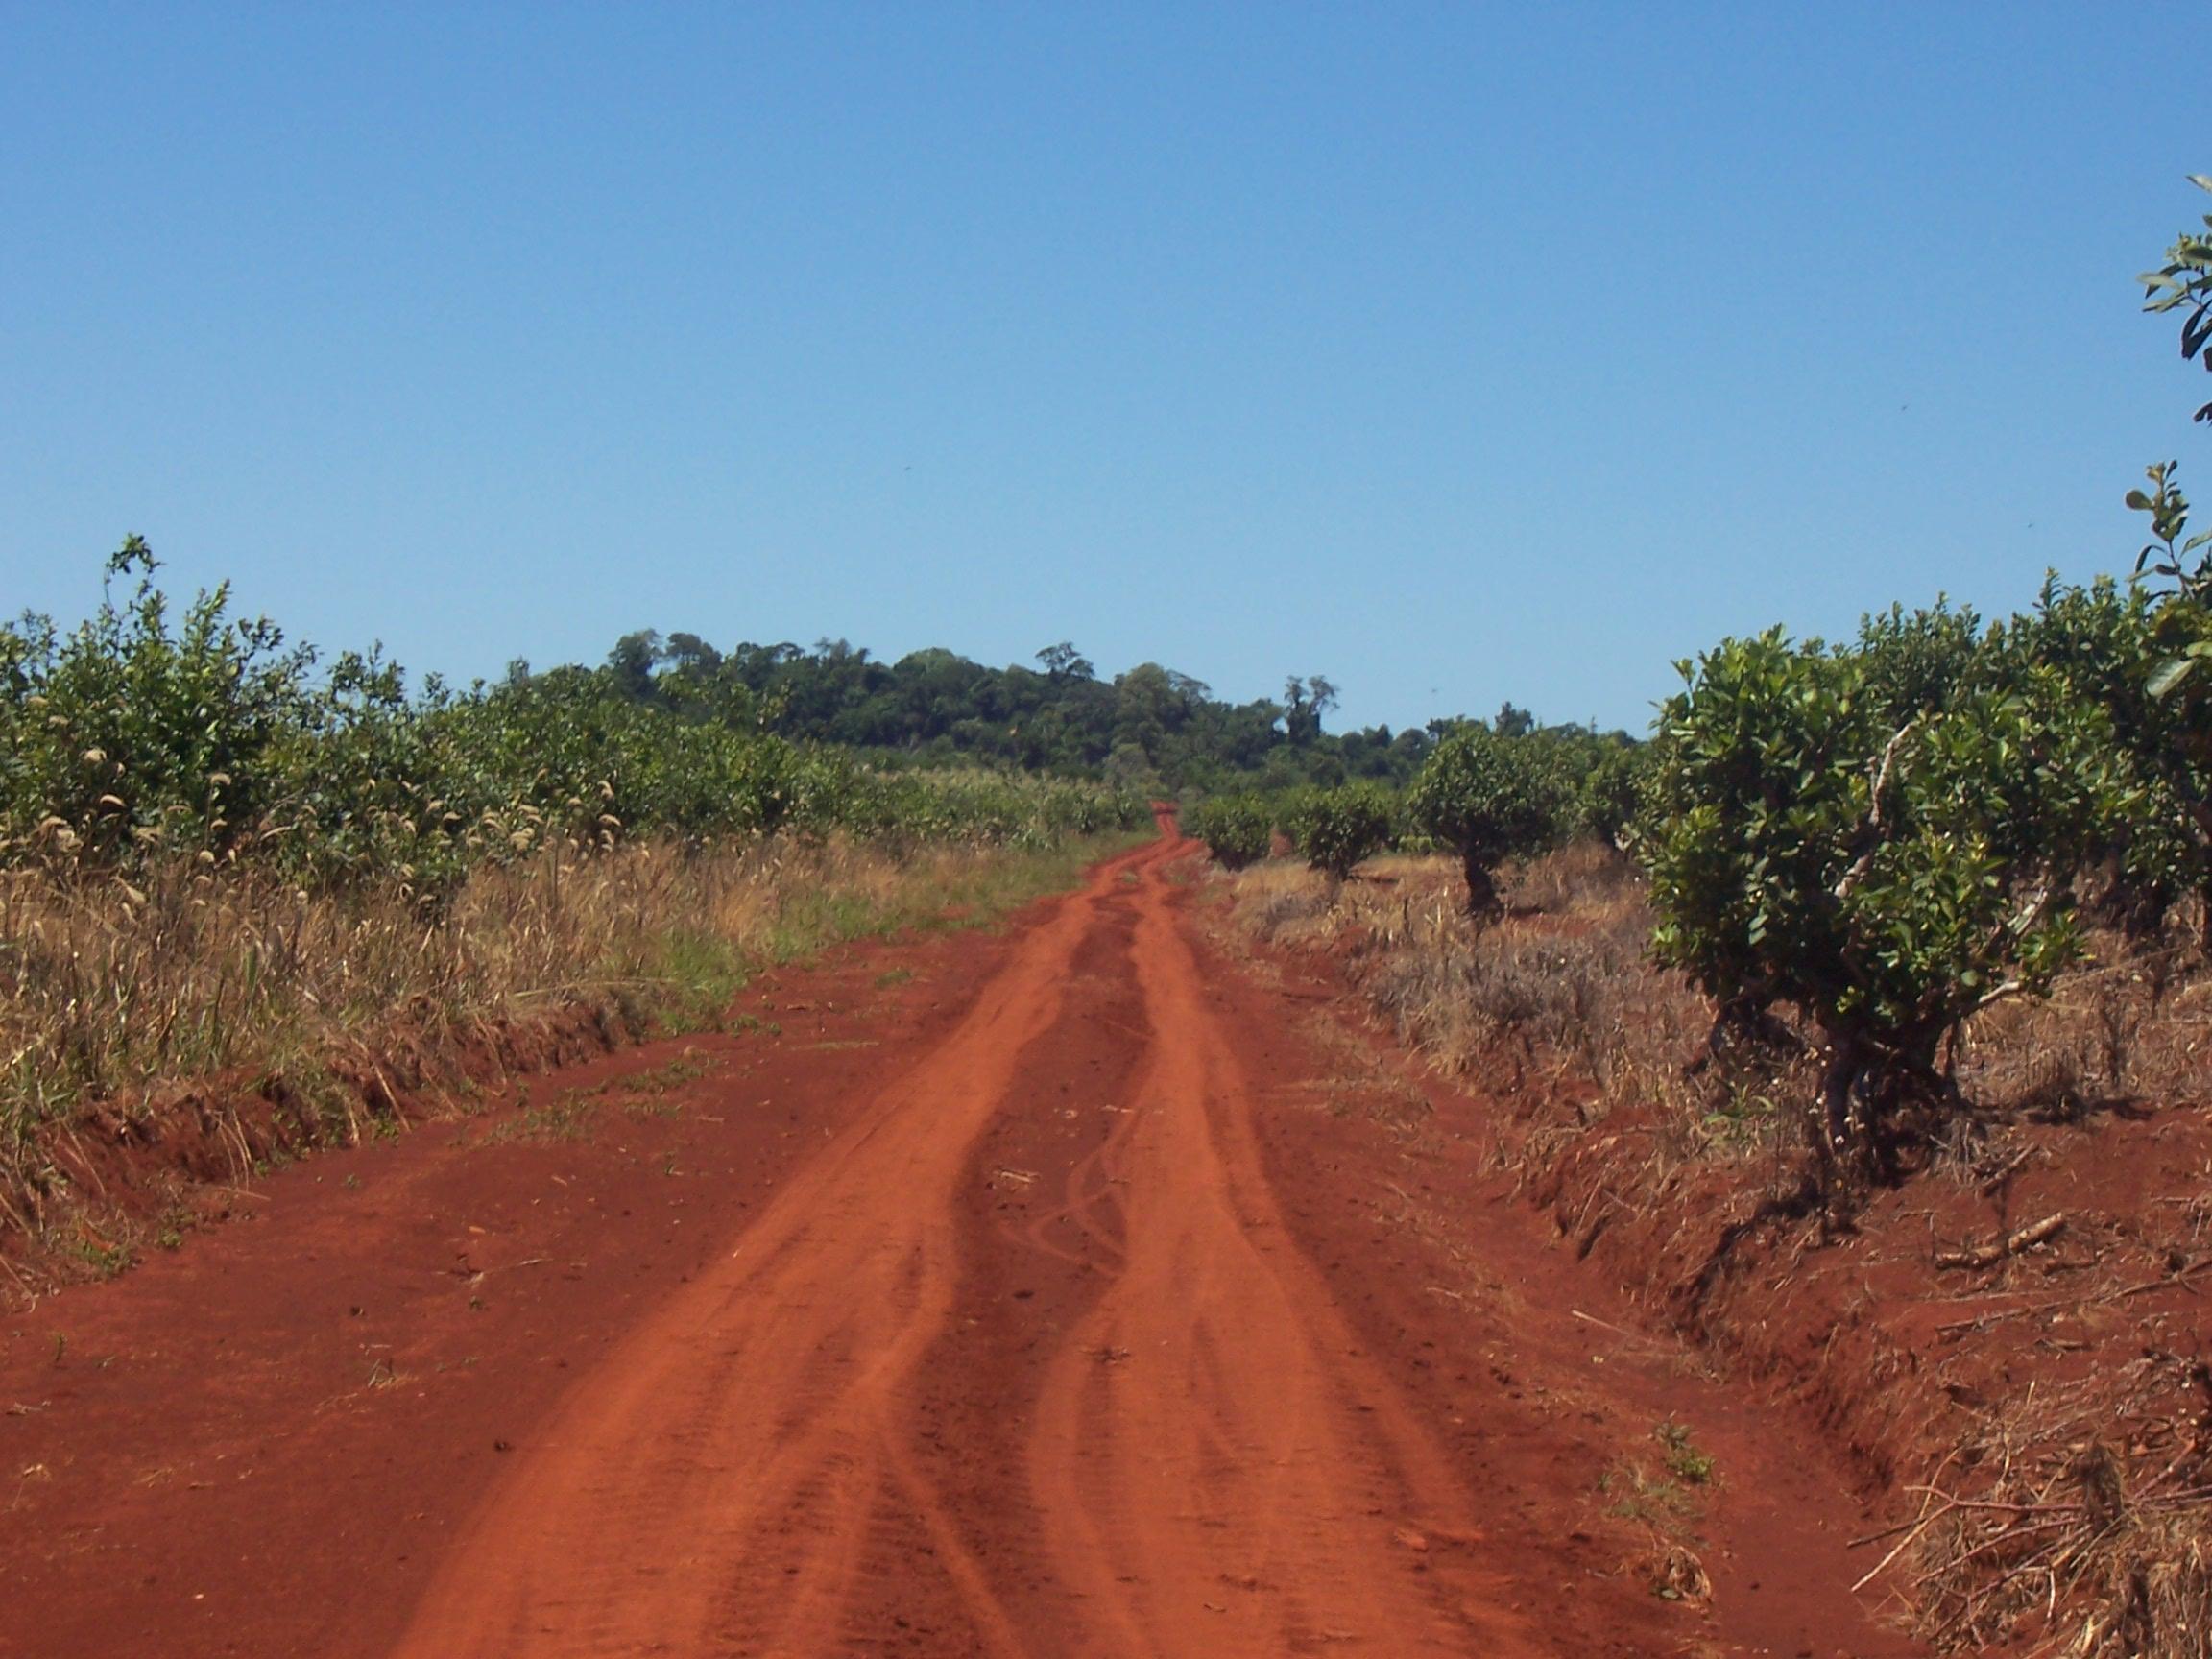 Meseta misionera 466 diversidad del medio natural - Fotos terras ...